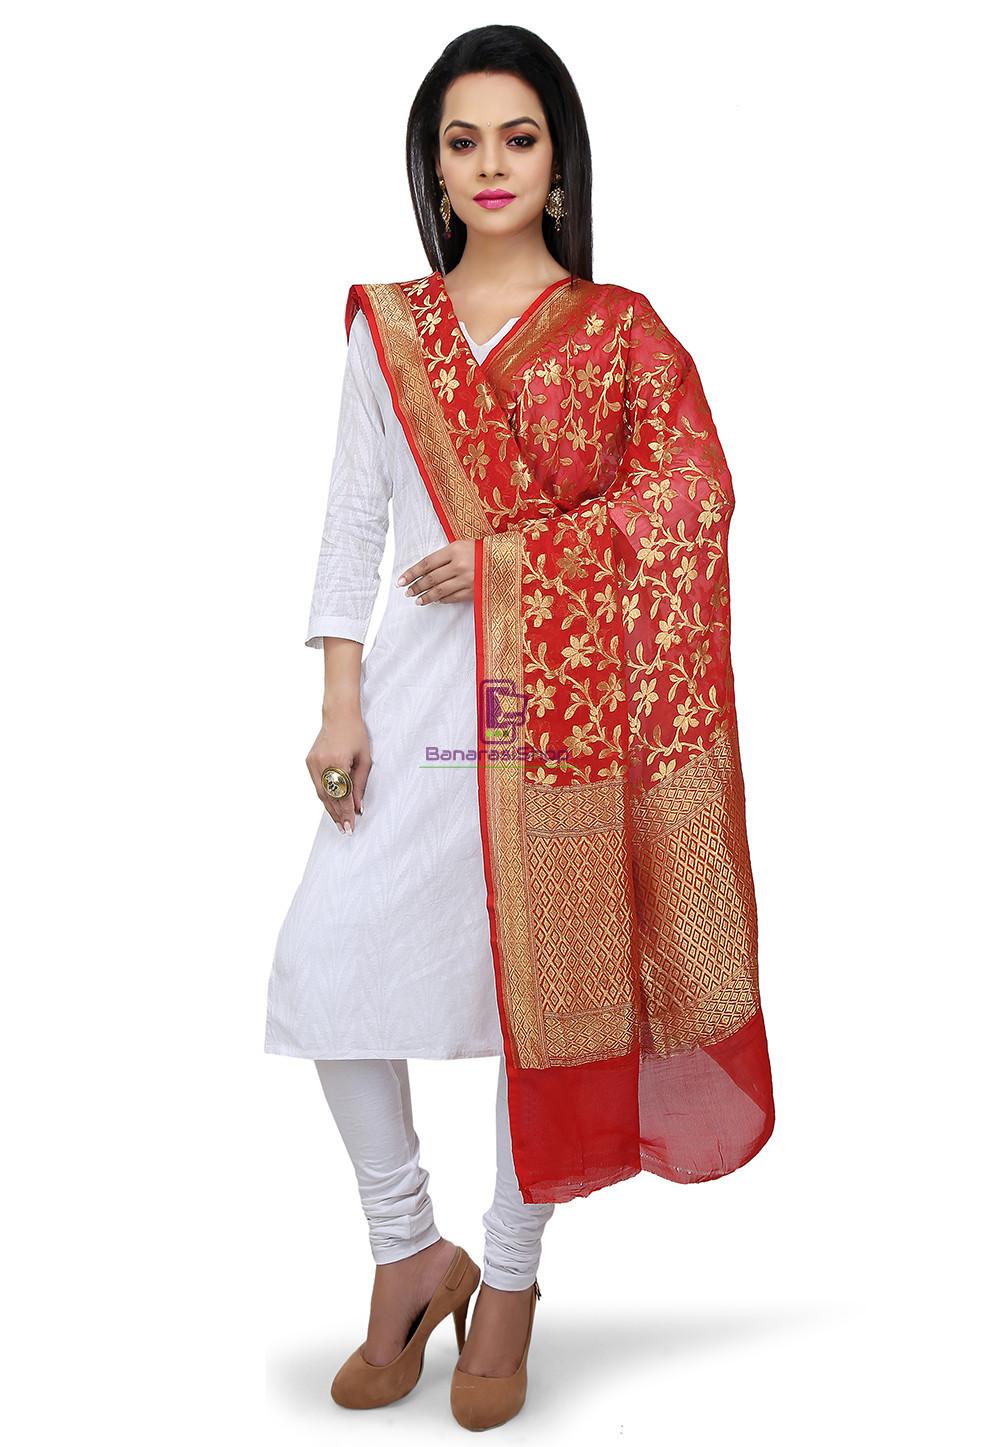 Handloom Banarasi Pure Georgette Dupatta in Maroon 1